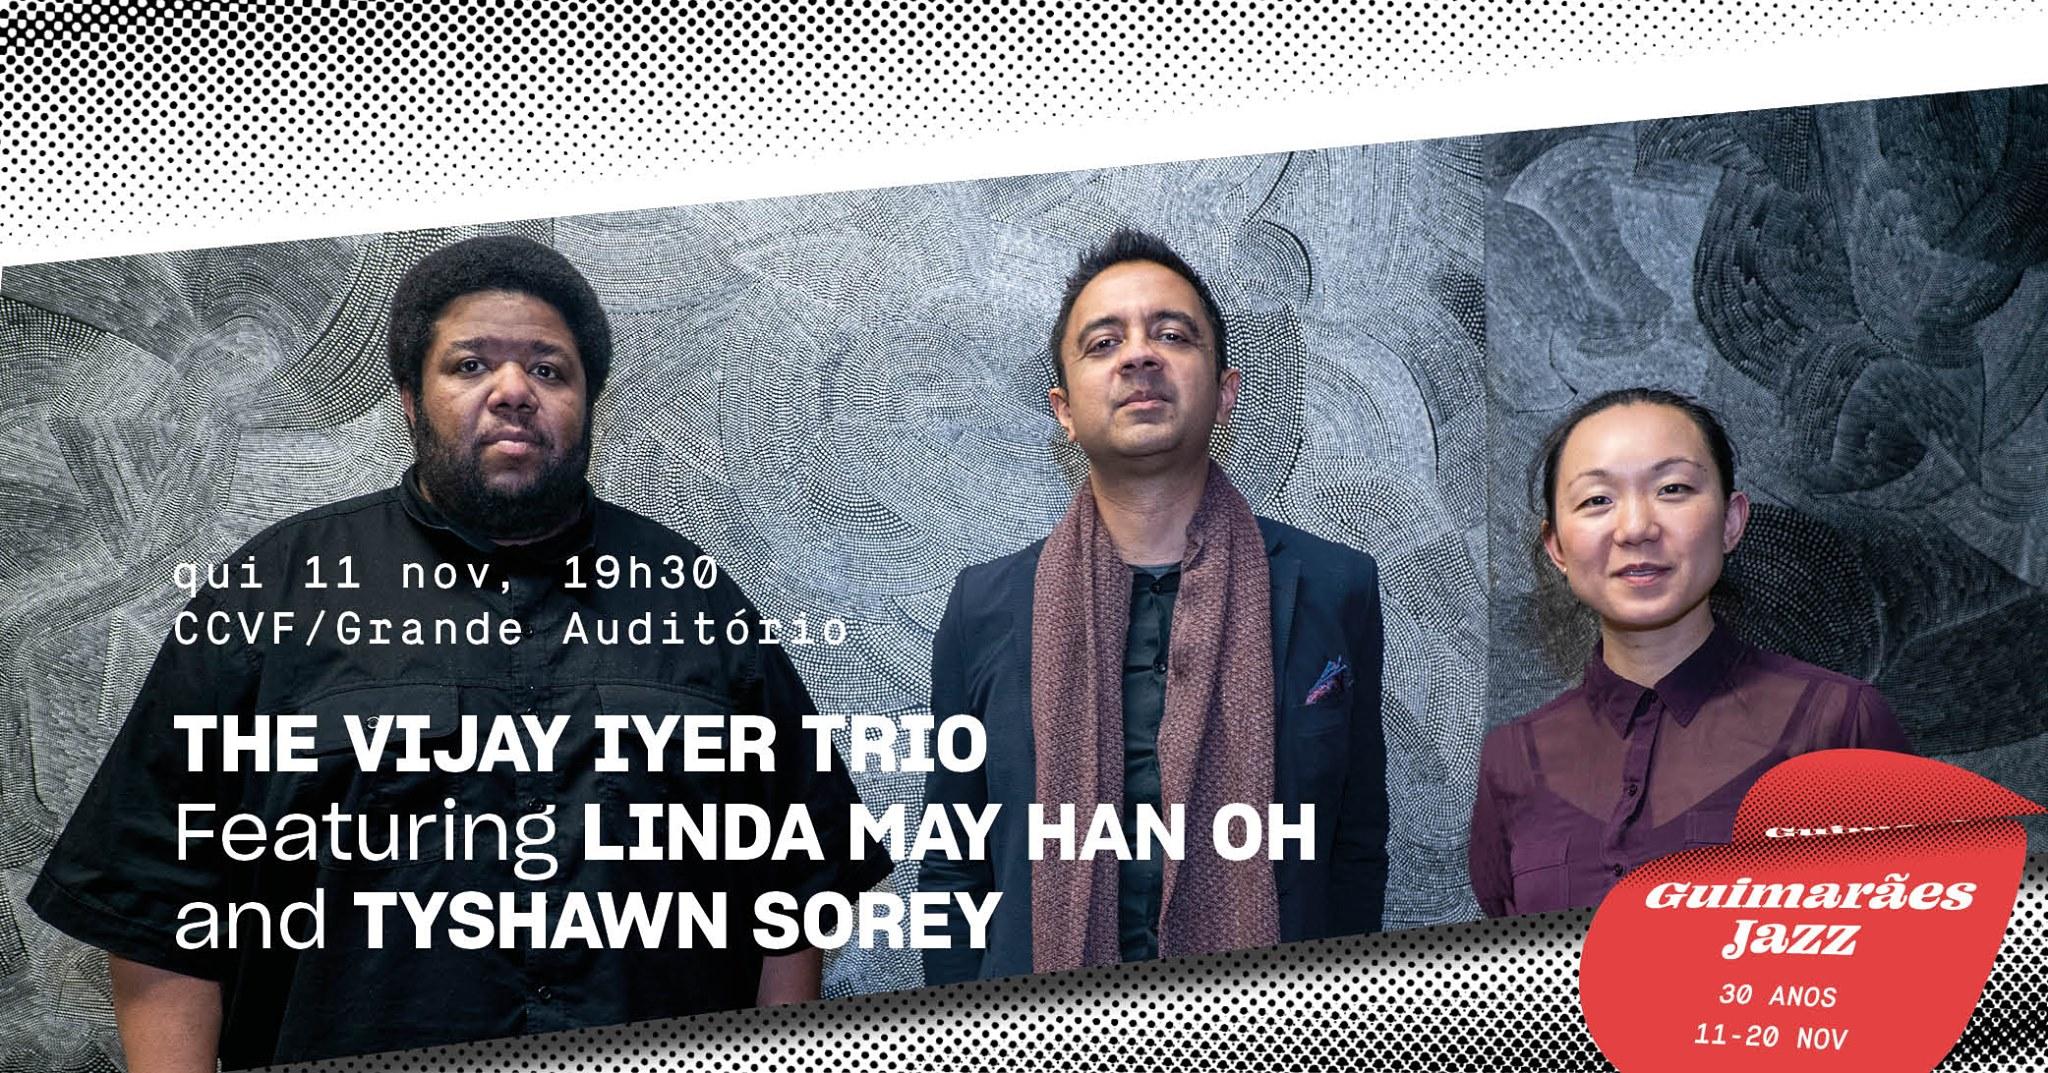 Guimarães Jazz 2021 • The Vijay Iyer Trio